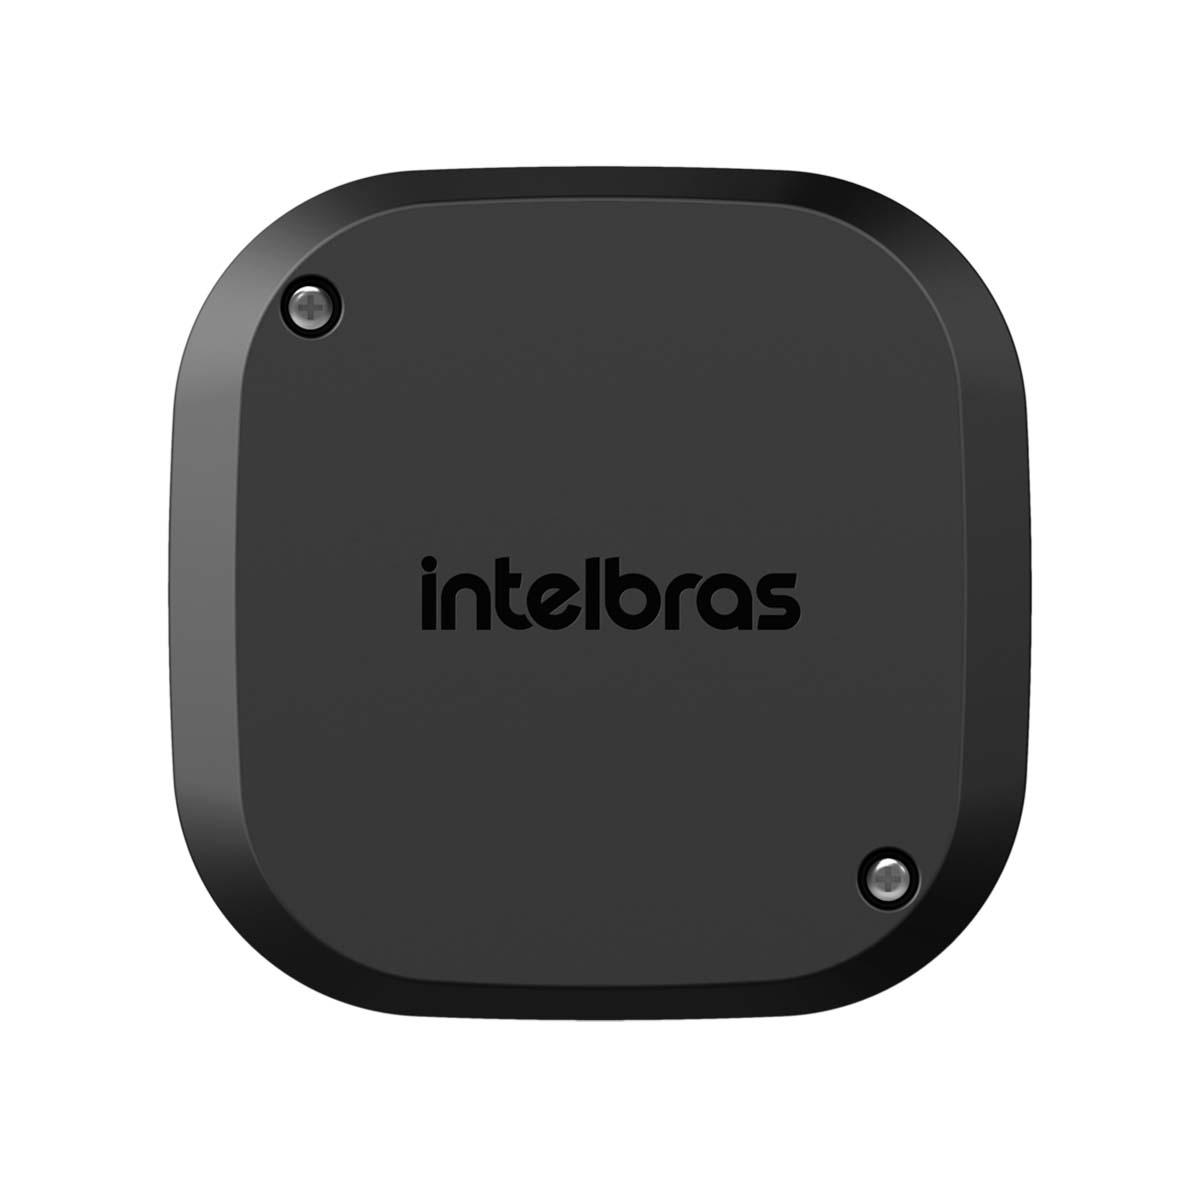 KIT 07 CAIXA PLASTICA DE PASSAGEM INTELBRAS VBOX 1100 BLACK